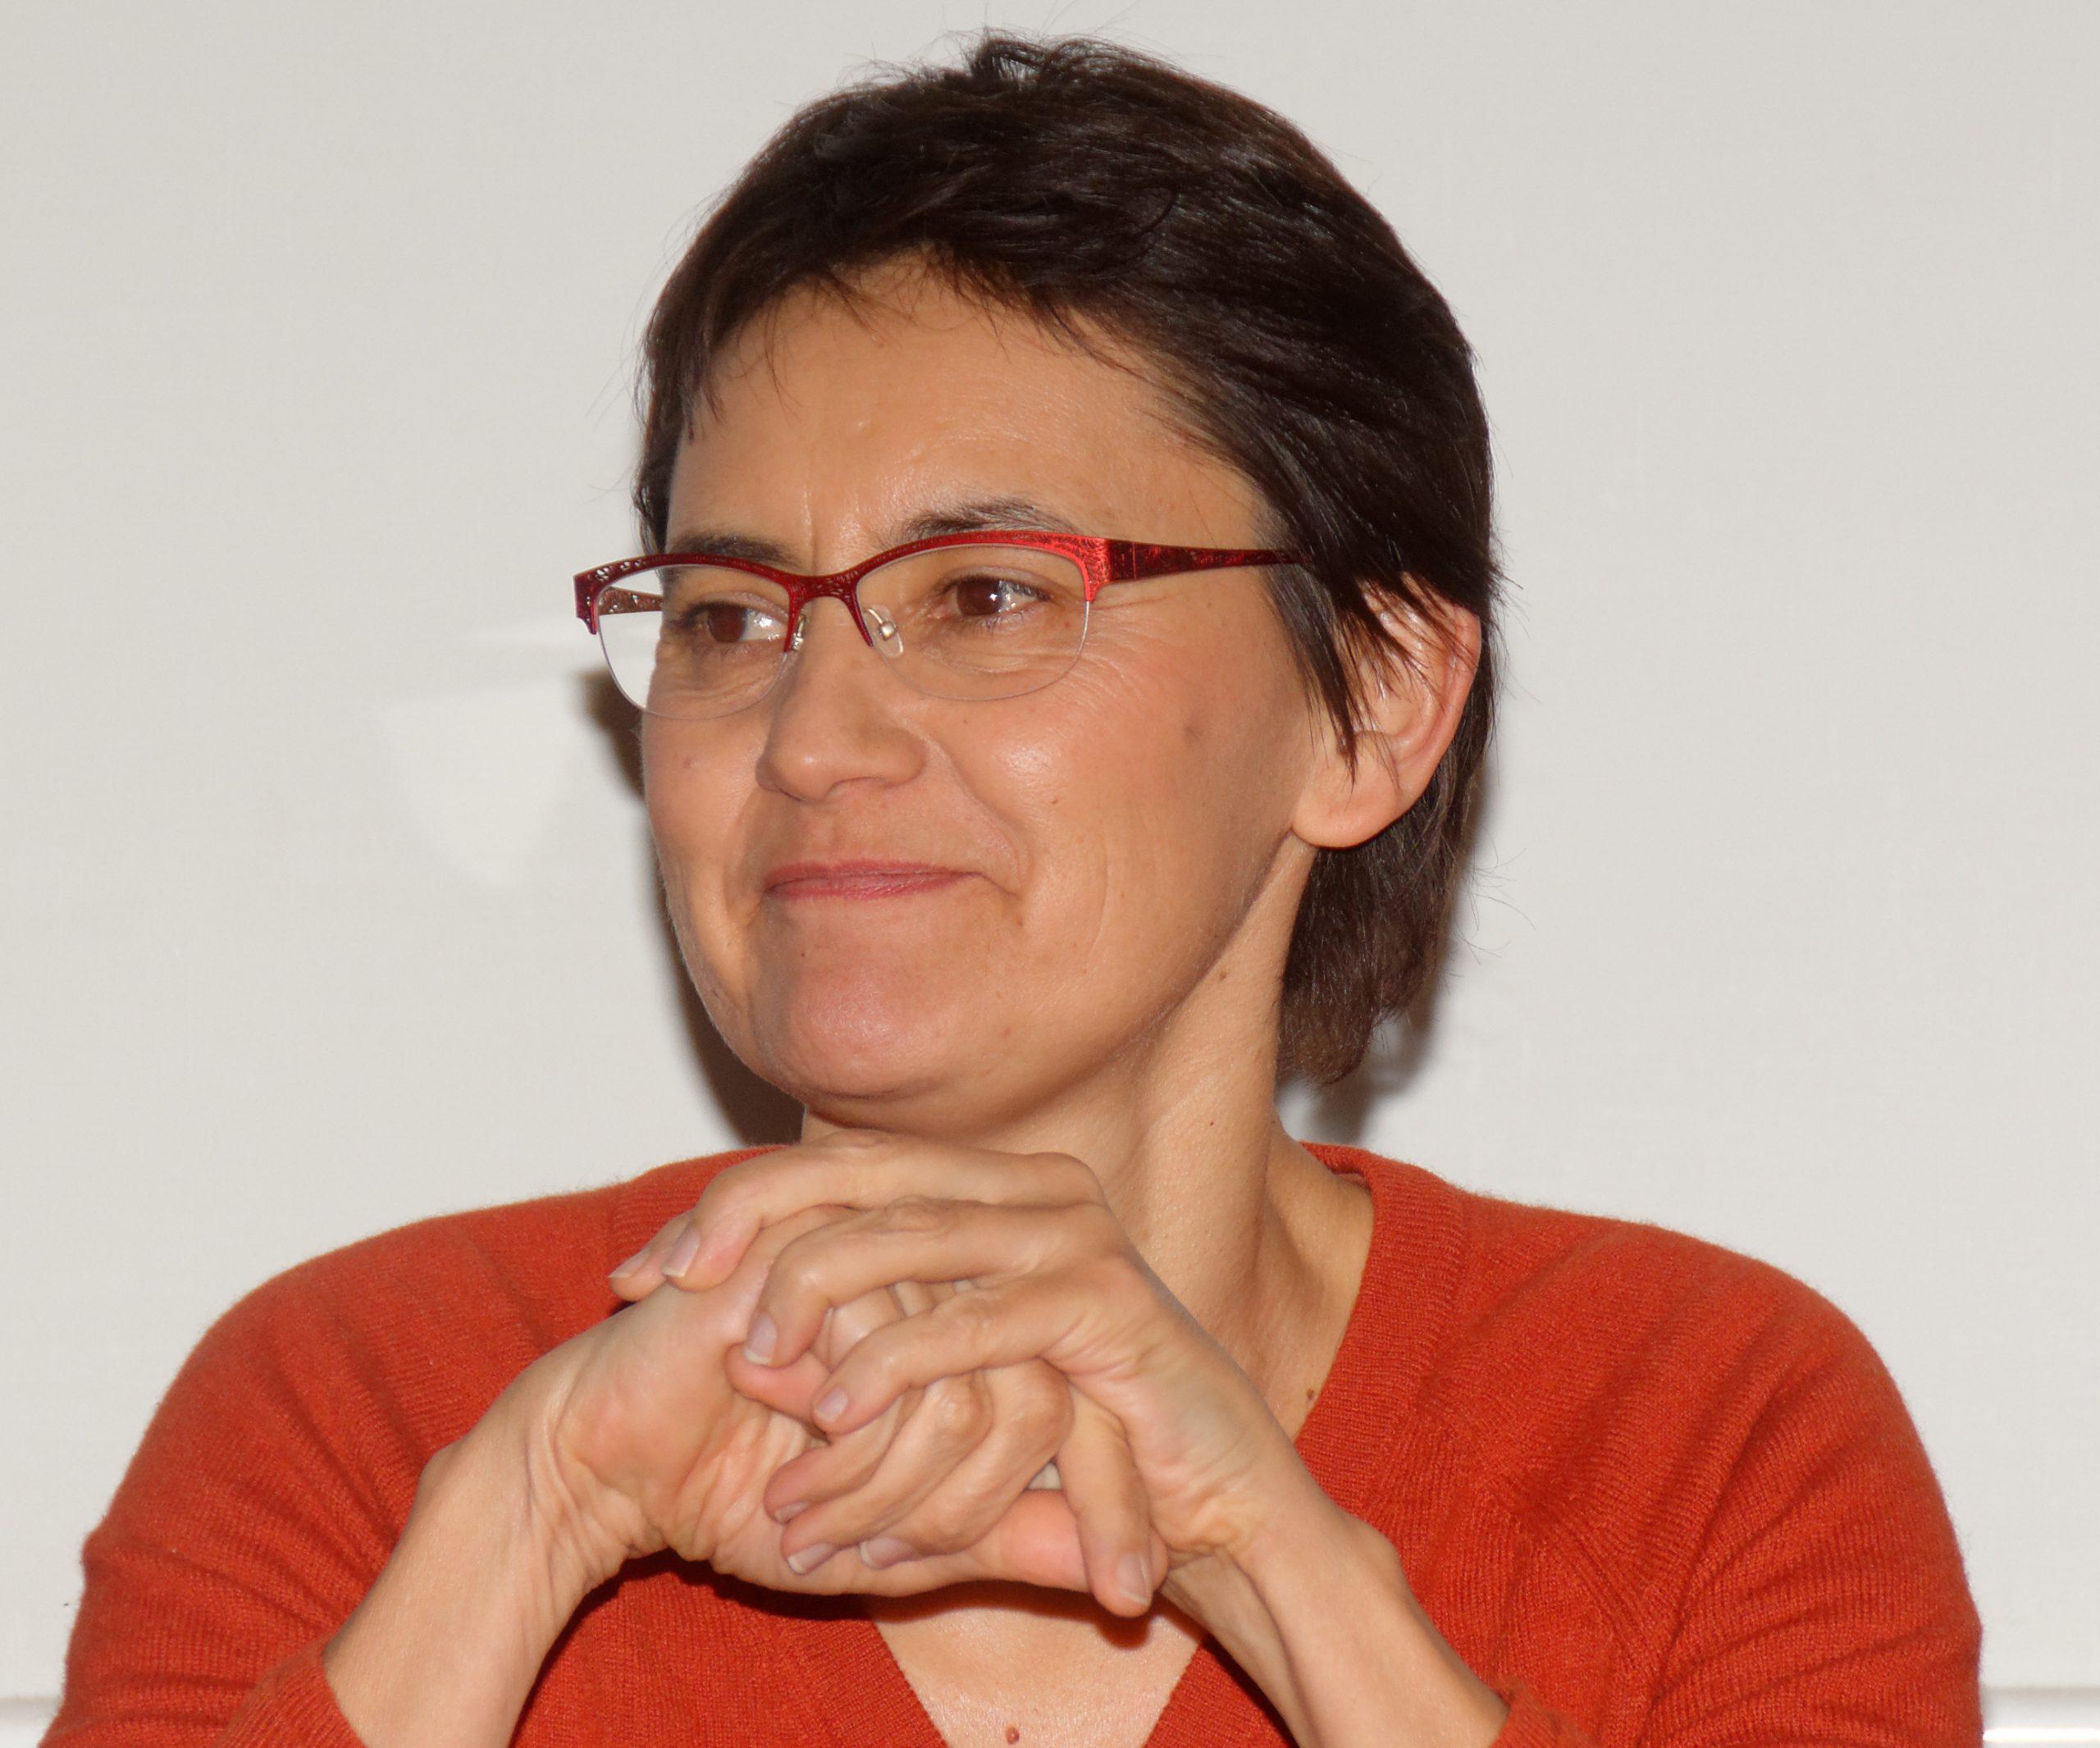 Nathalie Arthaud — Crédits : Thomas Bresson / Wikimedia Commons CC BY 4.0